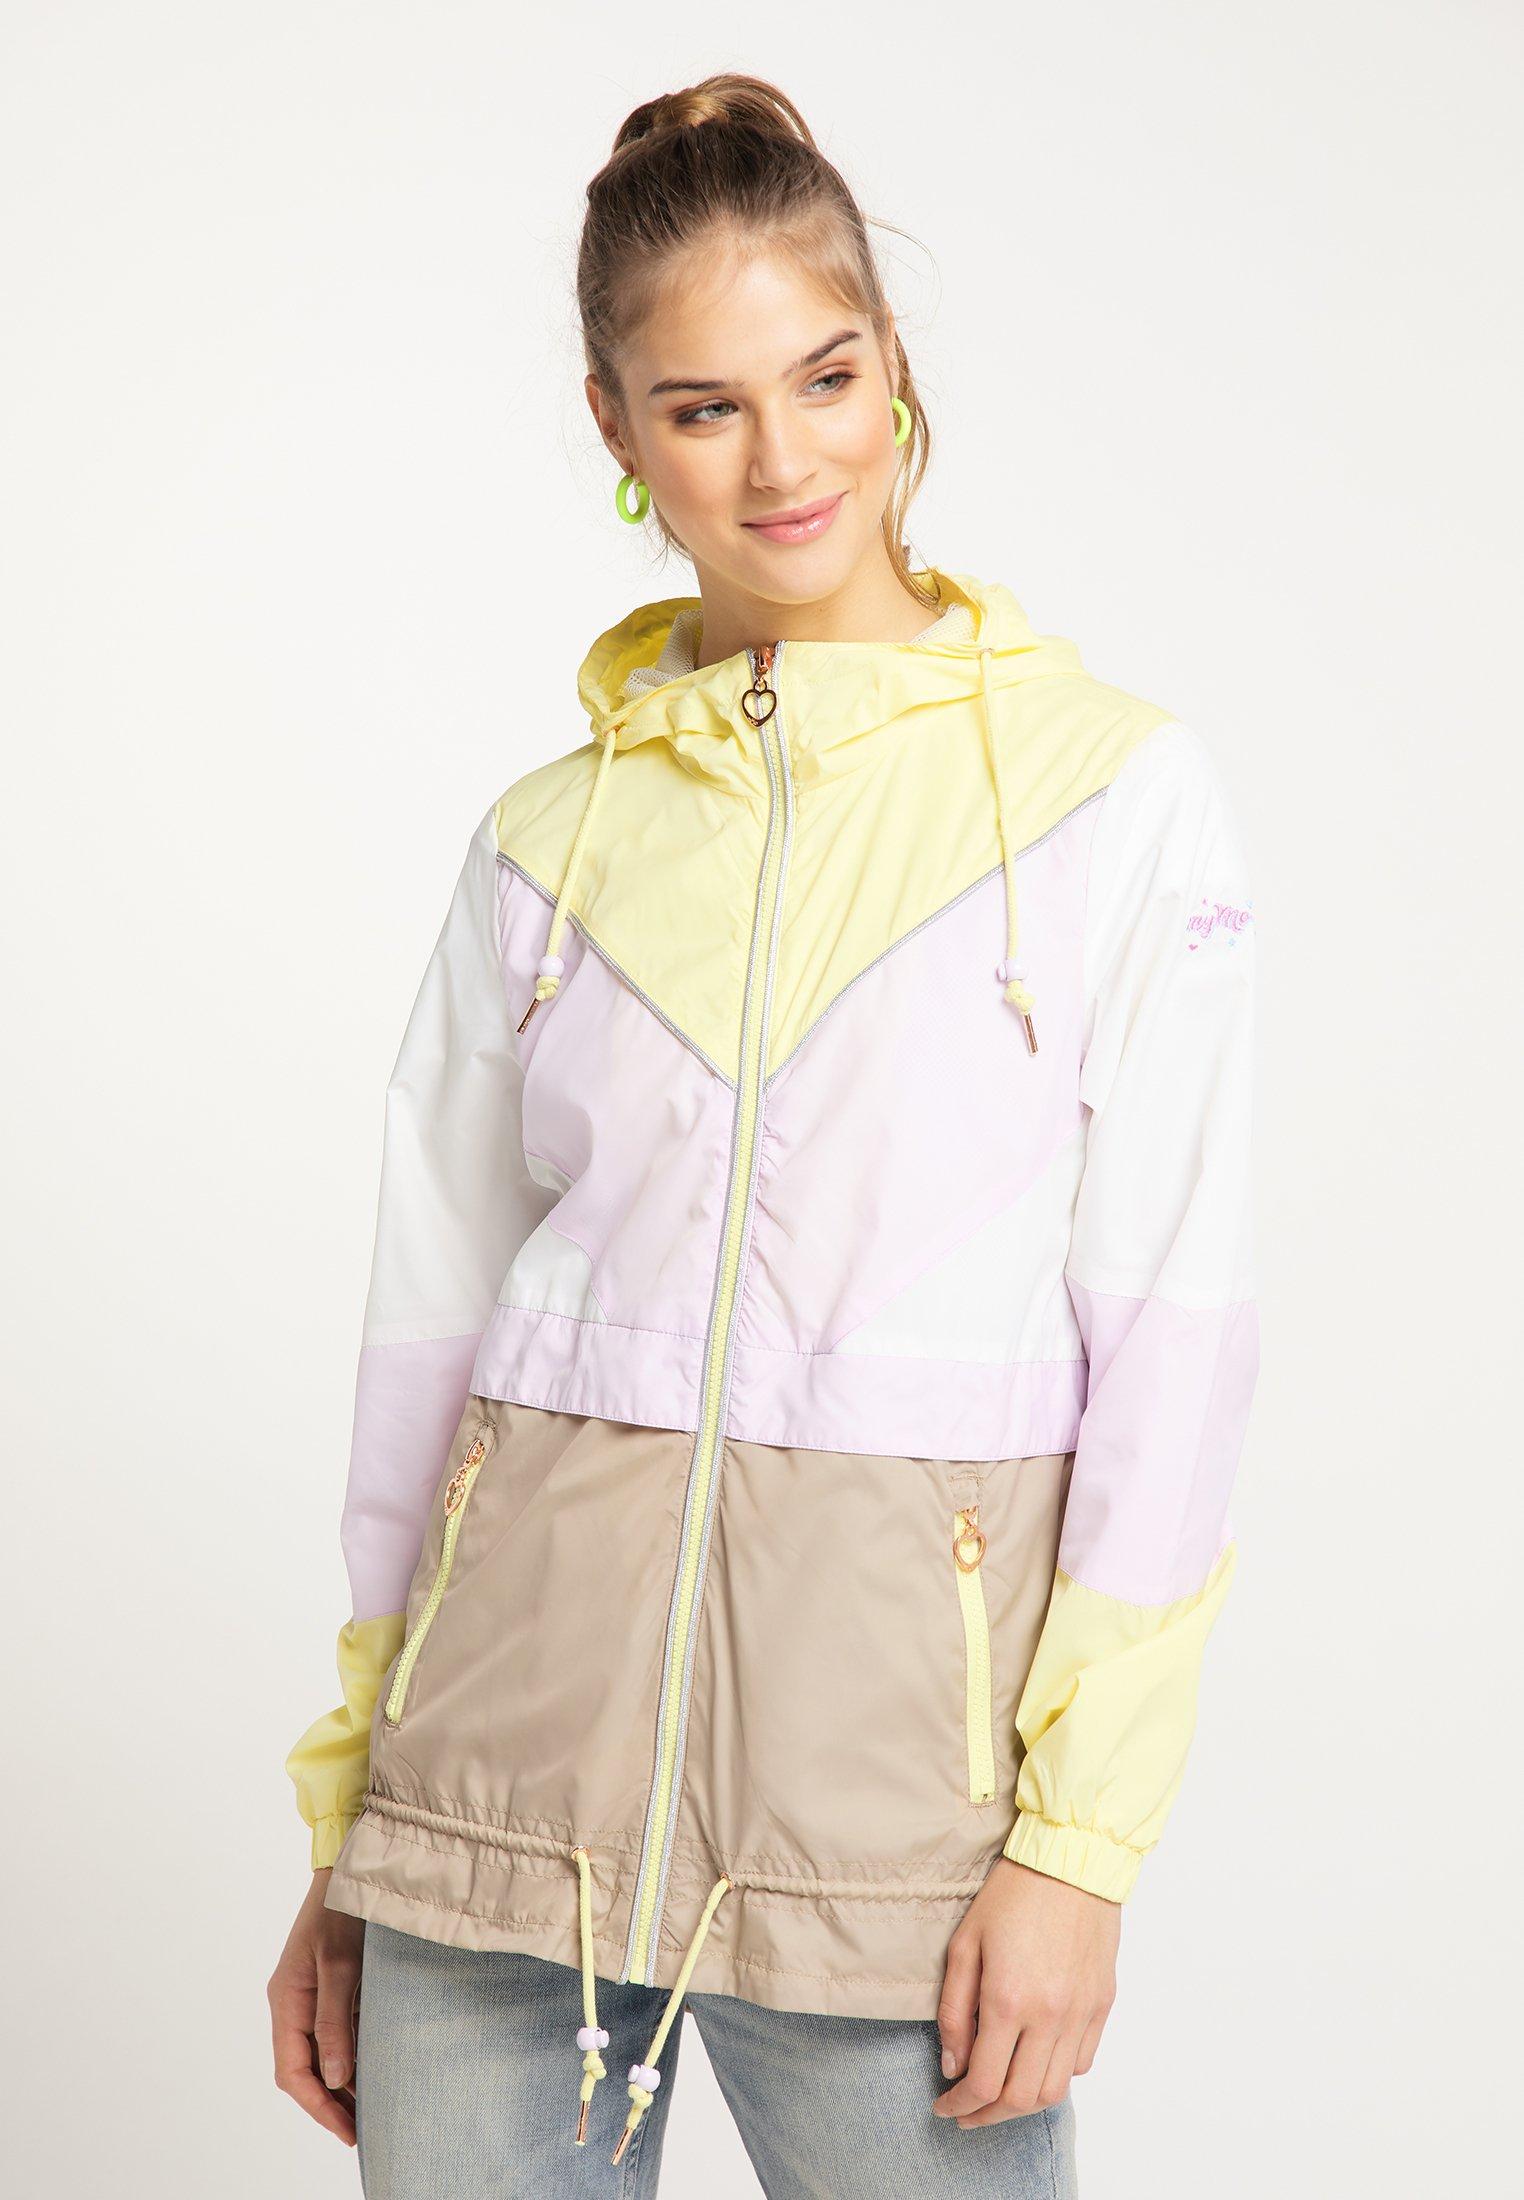 Limit Offer Cheap Women's Clothing myMo Summer jacket yellow 46U2UoVxI